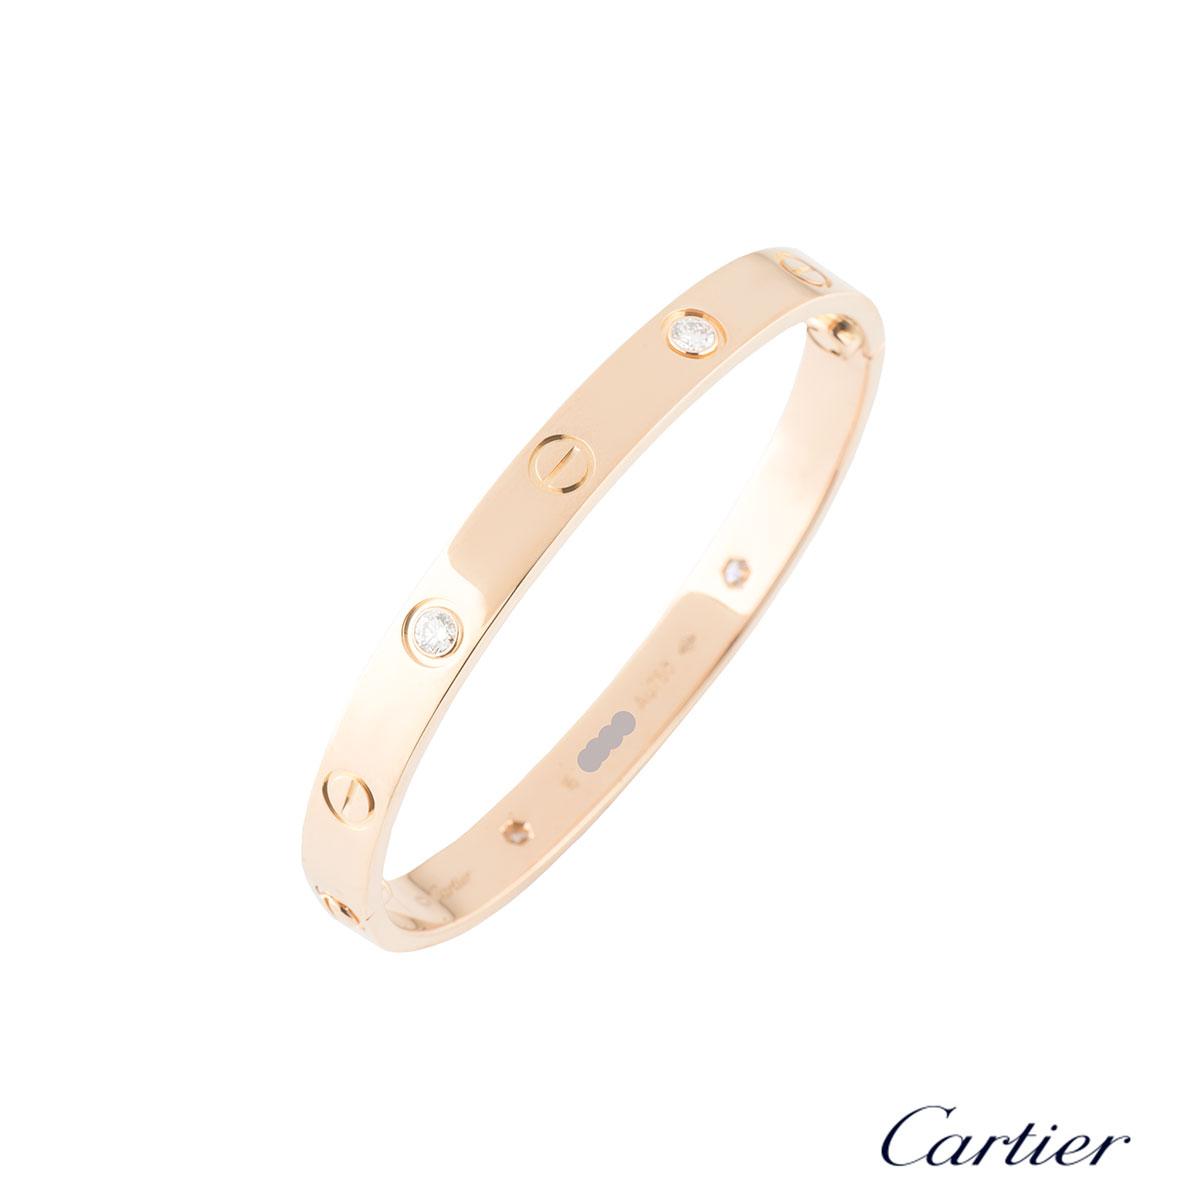 CartierRose Gold Half Diamond Love Bracelet Size 16B6036016